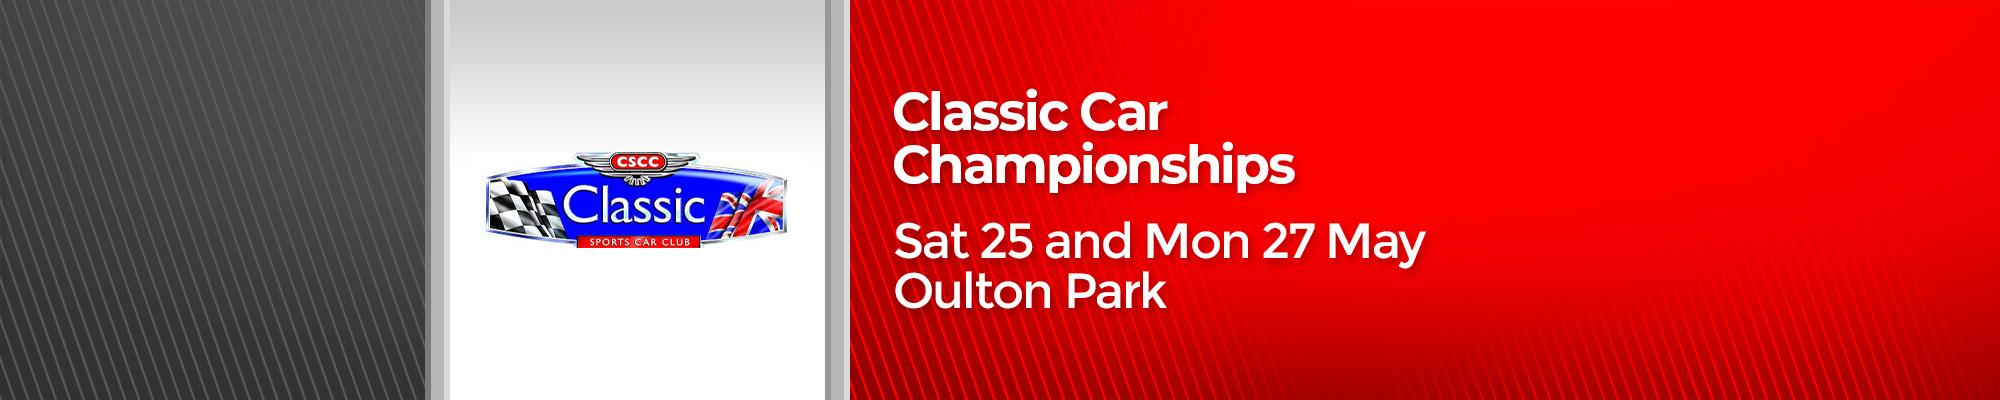 CSCC Classic Car Championships